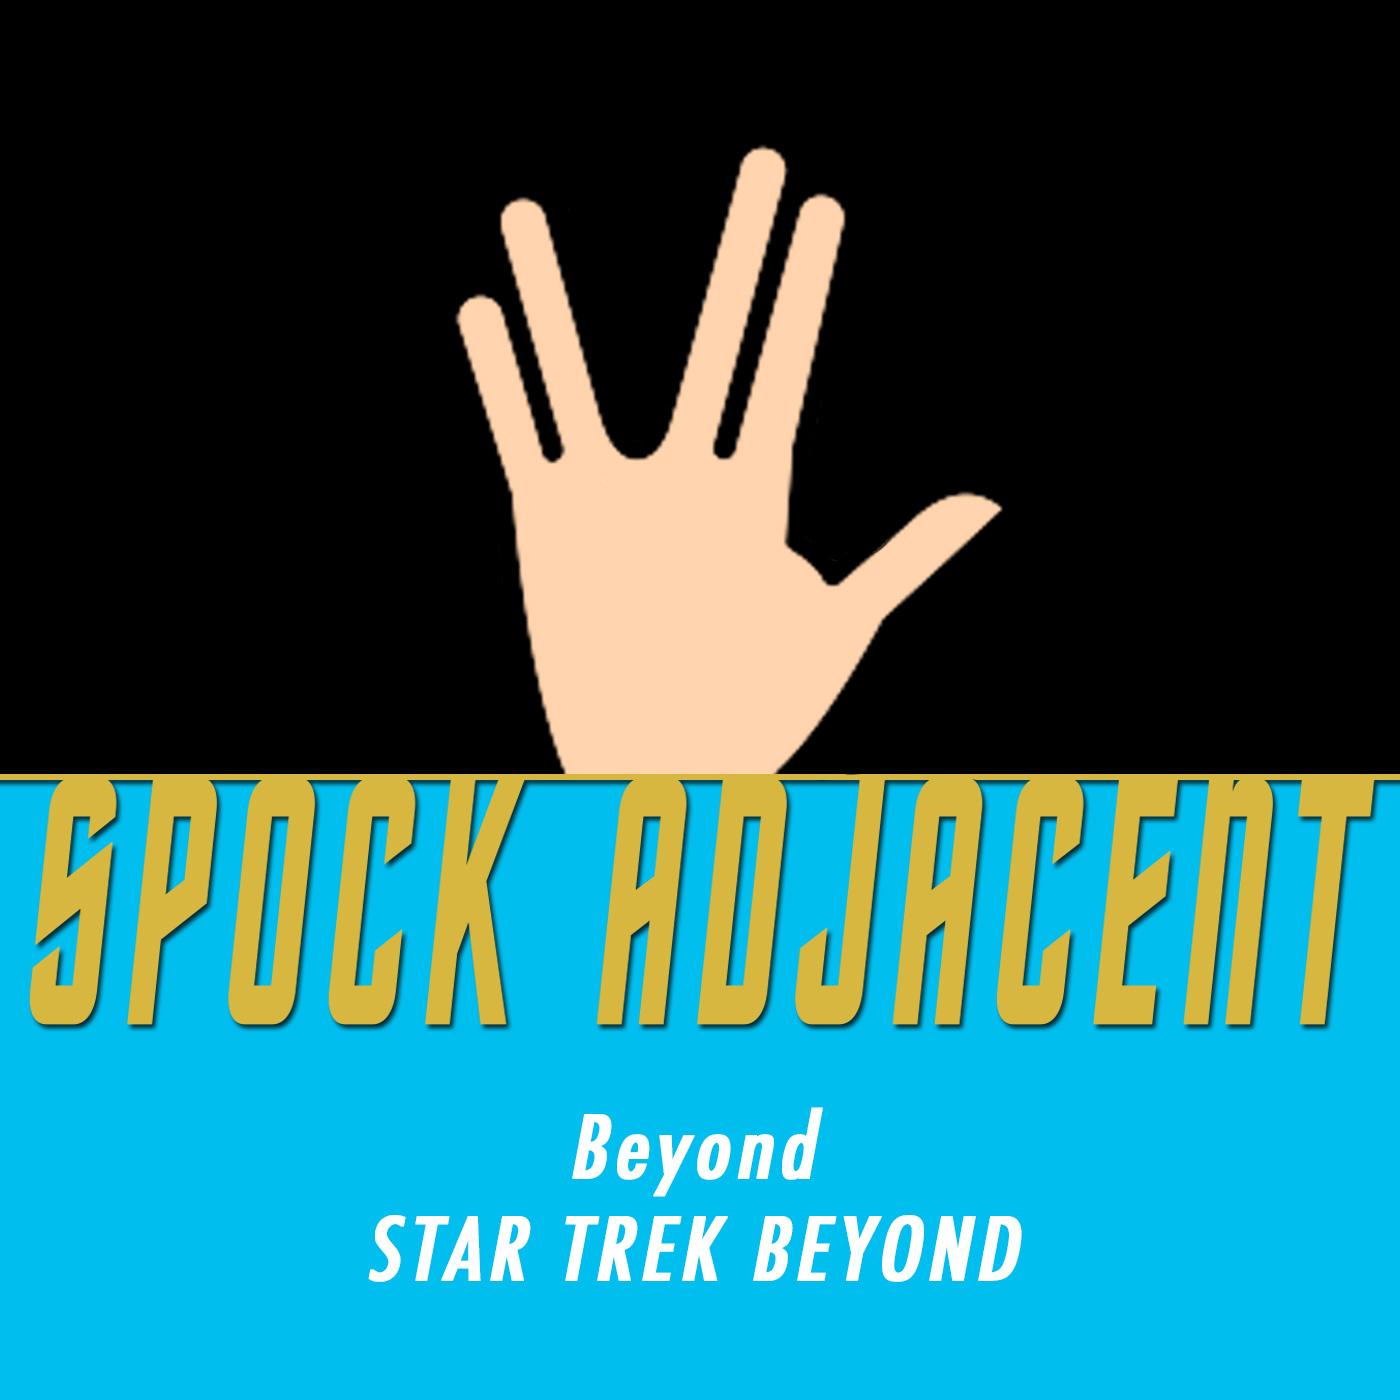 Beyond-STAR-TREK-BEYOND.jpg